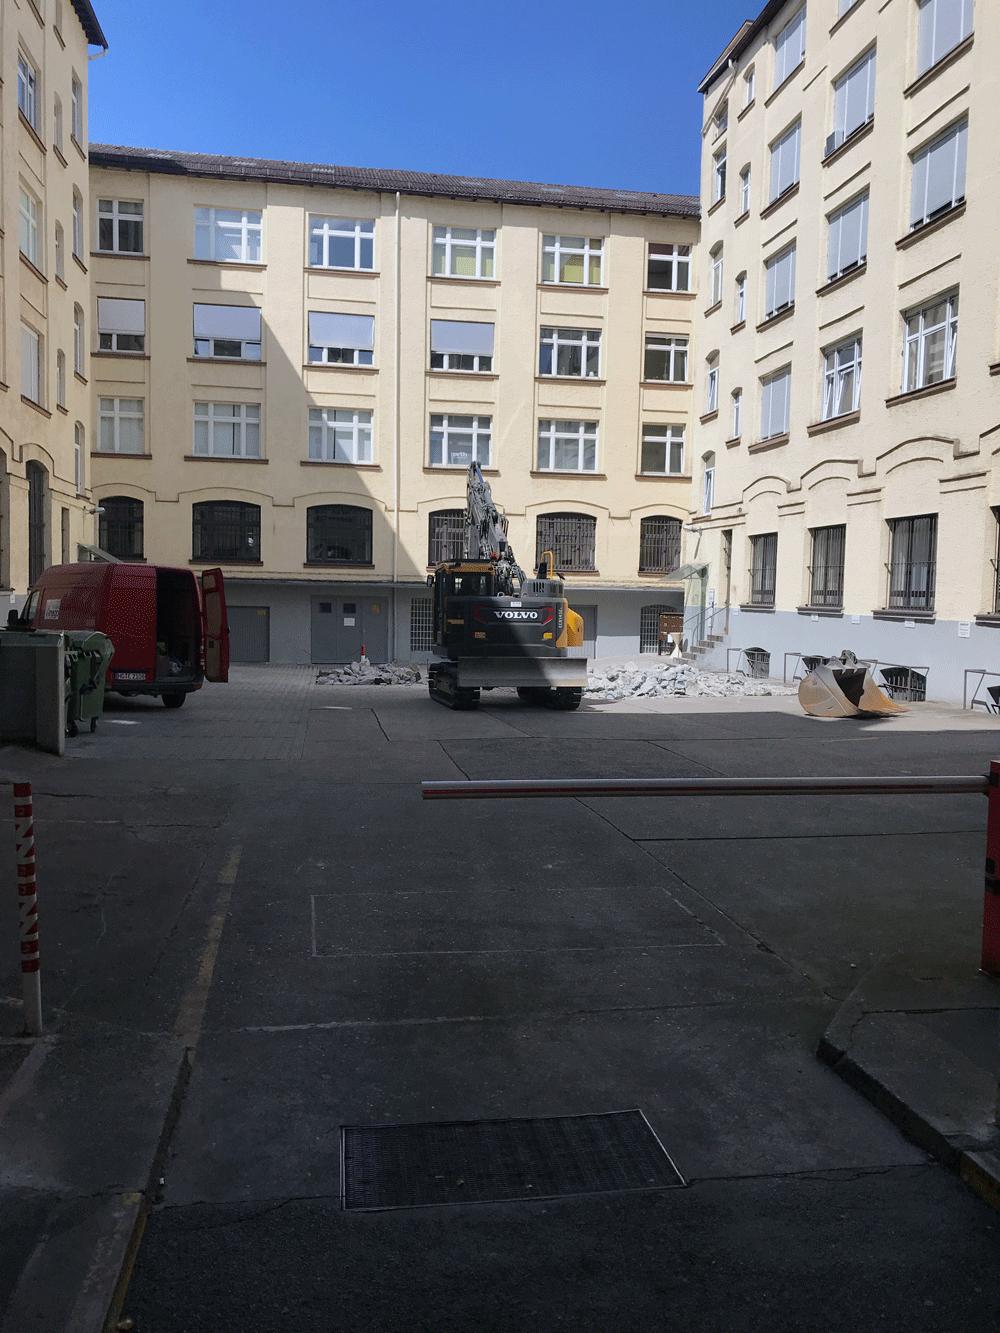 Offenbach-1